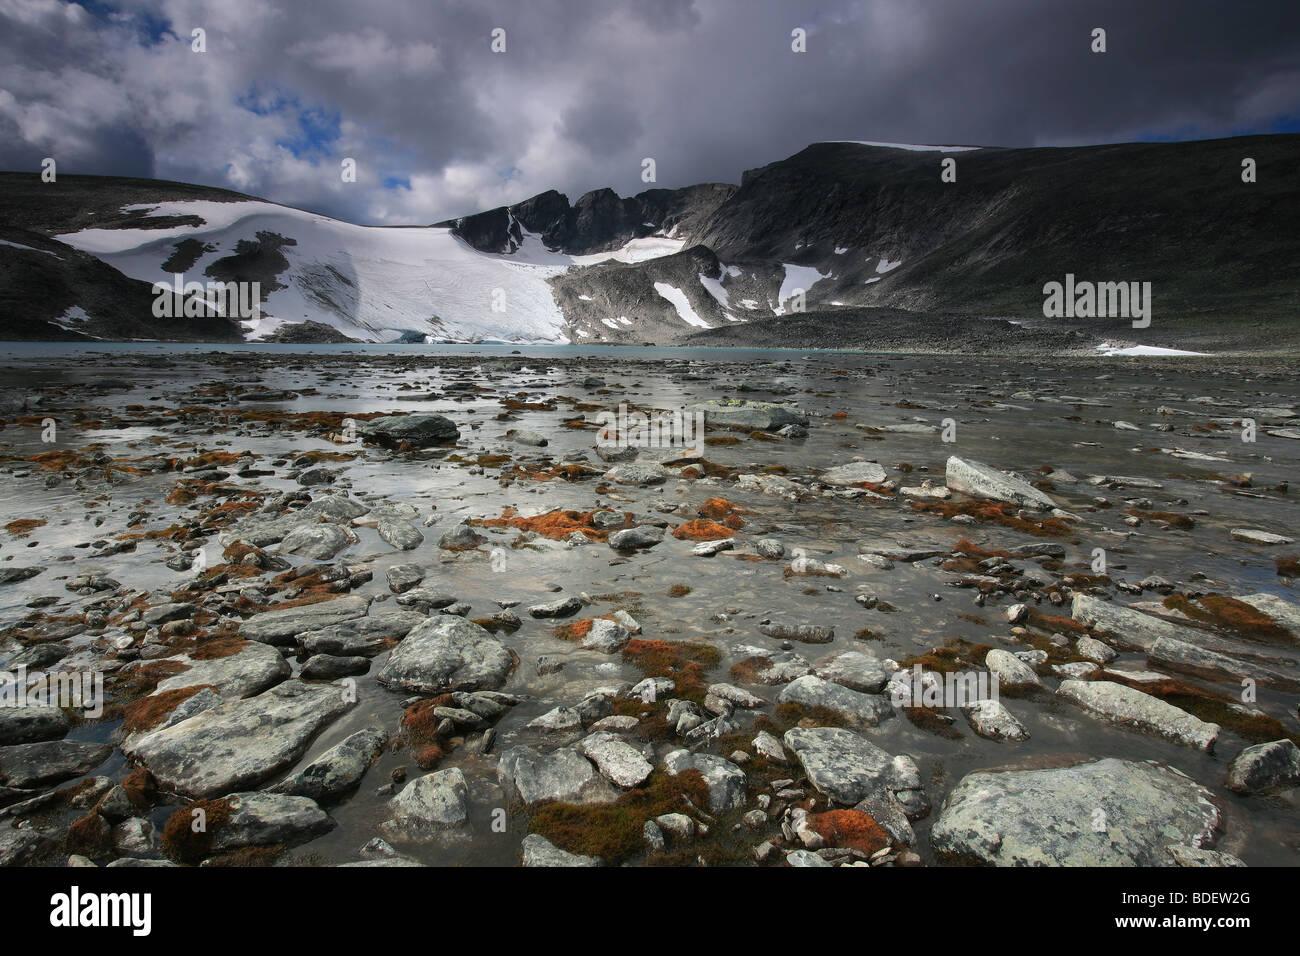 Rocky terrain under the mountain Snøhetta, 2286 m, in Dovrefjell national park, Norway. - Stock Image